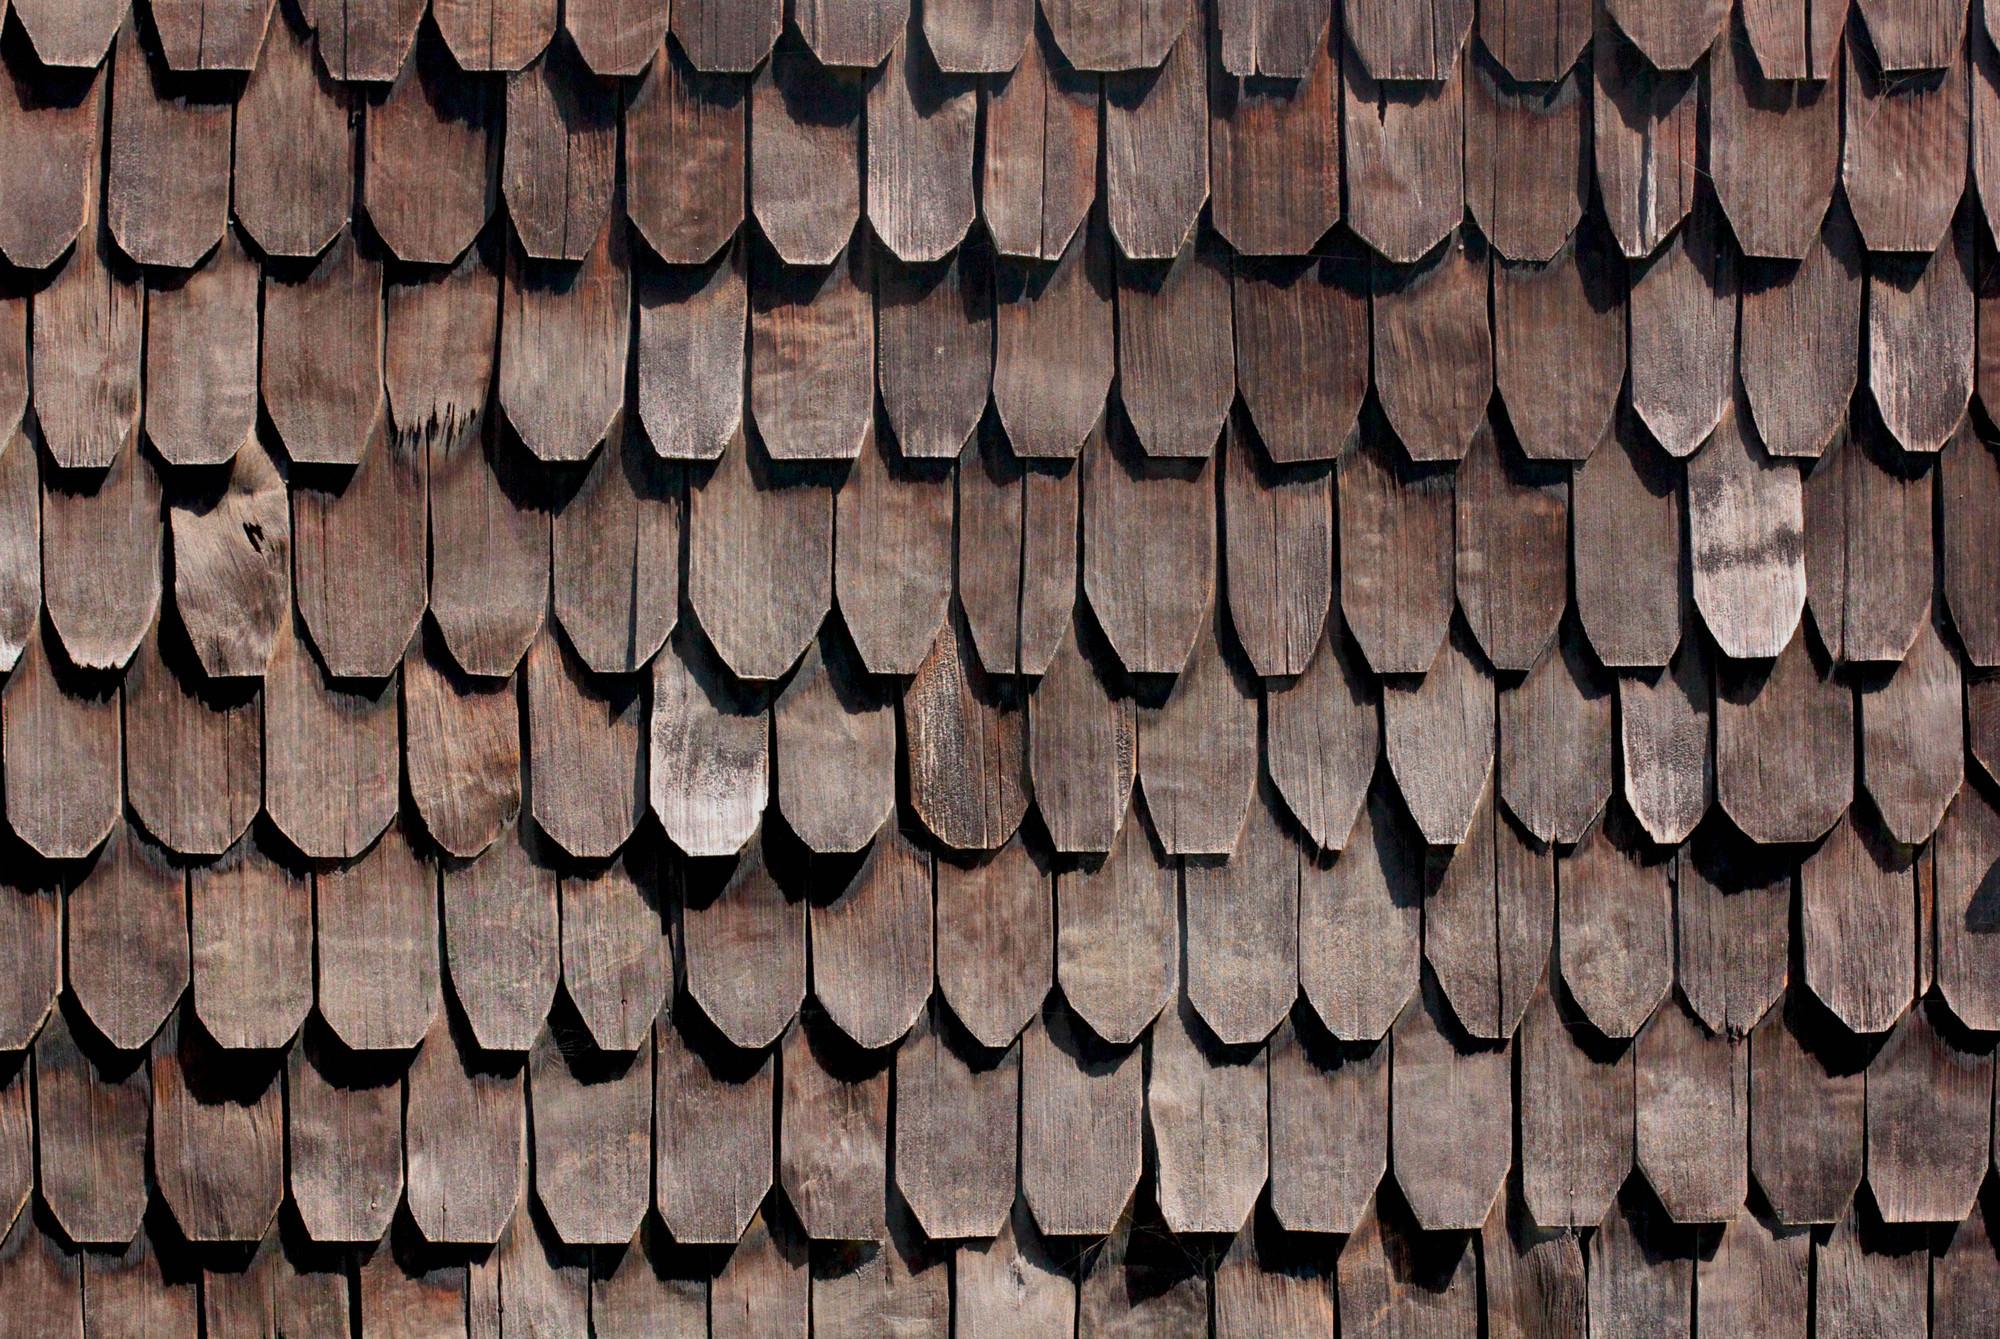 Arquitectura chilena tag plataforma arquitectura - Tejas para casas de madera ...